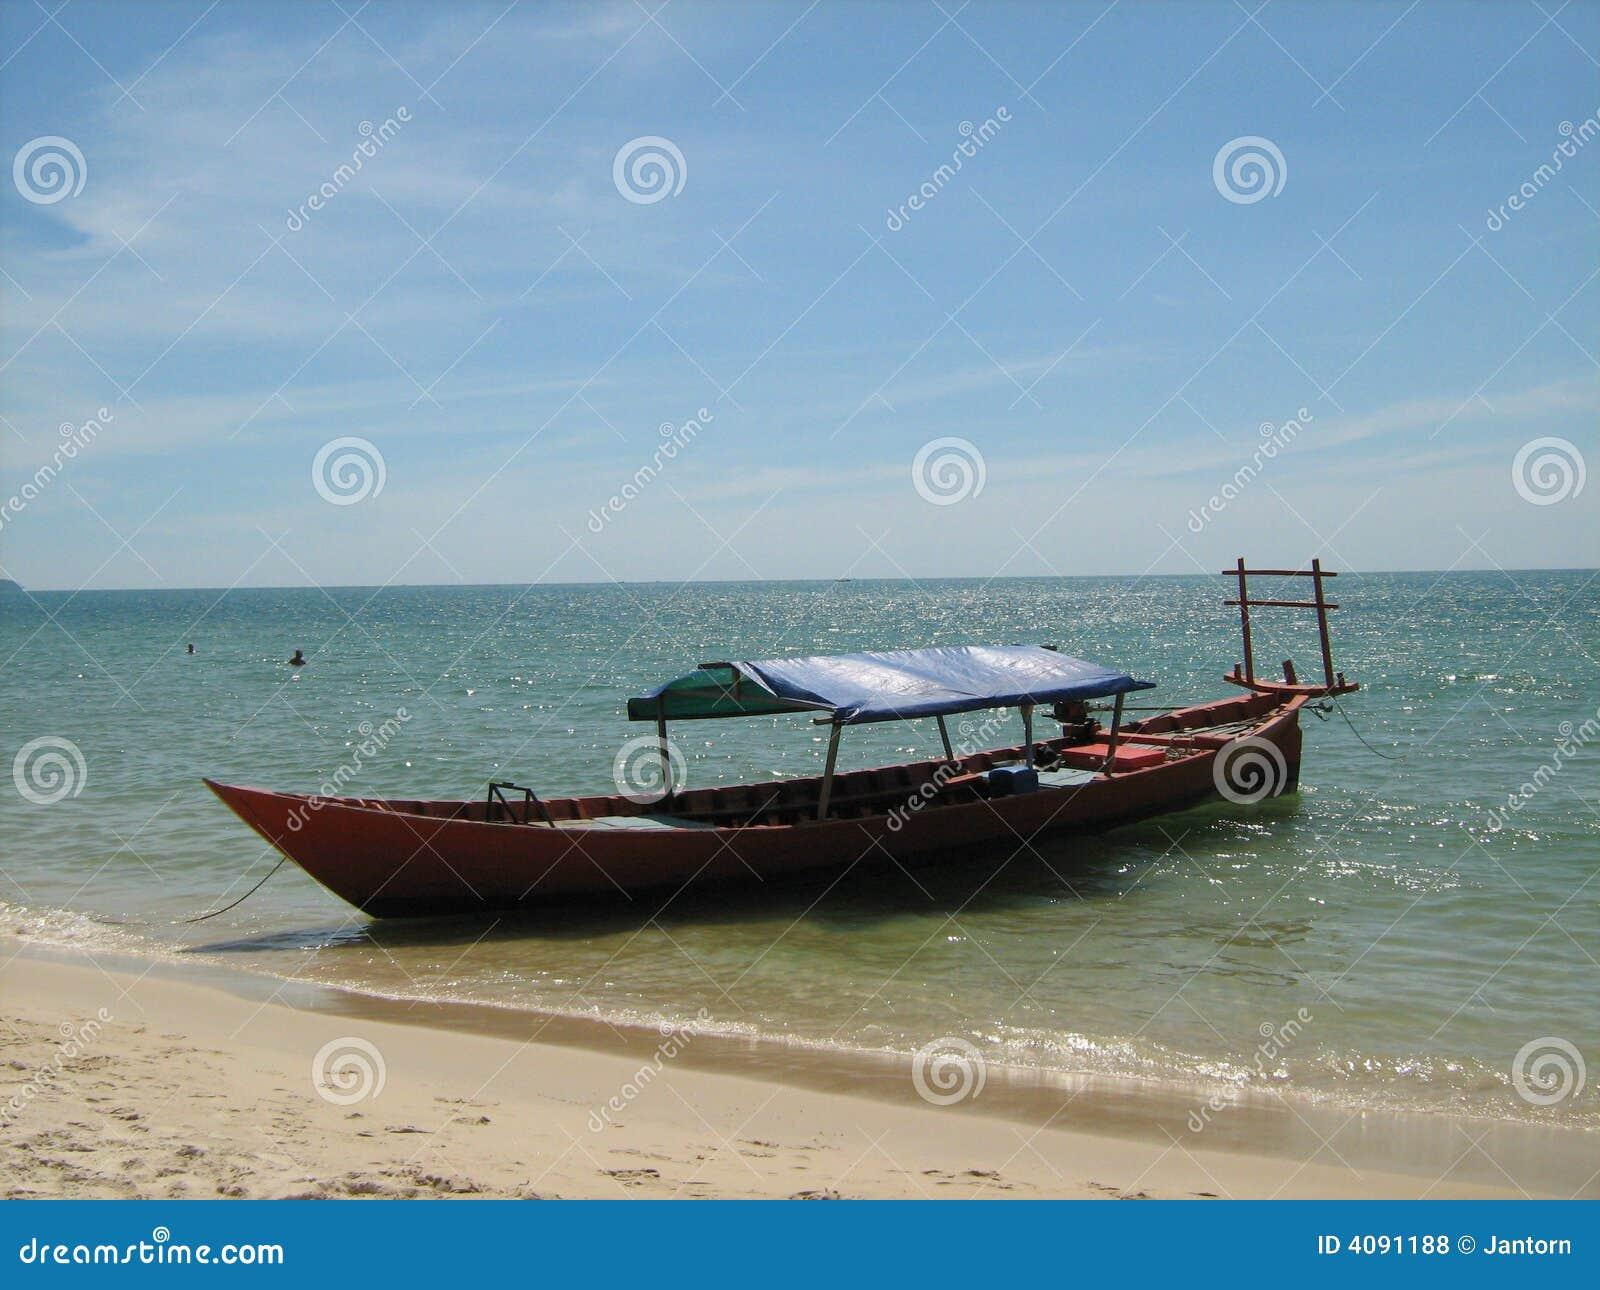 Best Hotels Near Sea Child Kampong Som Co.,Ltd, Sihanoukville, Cambodia